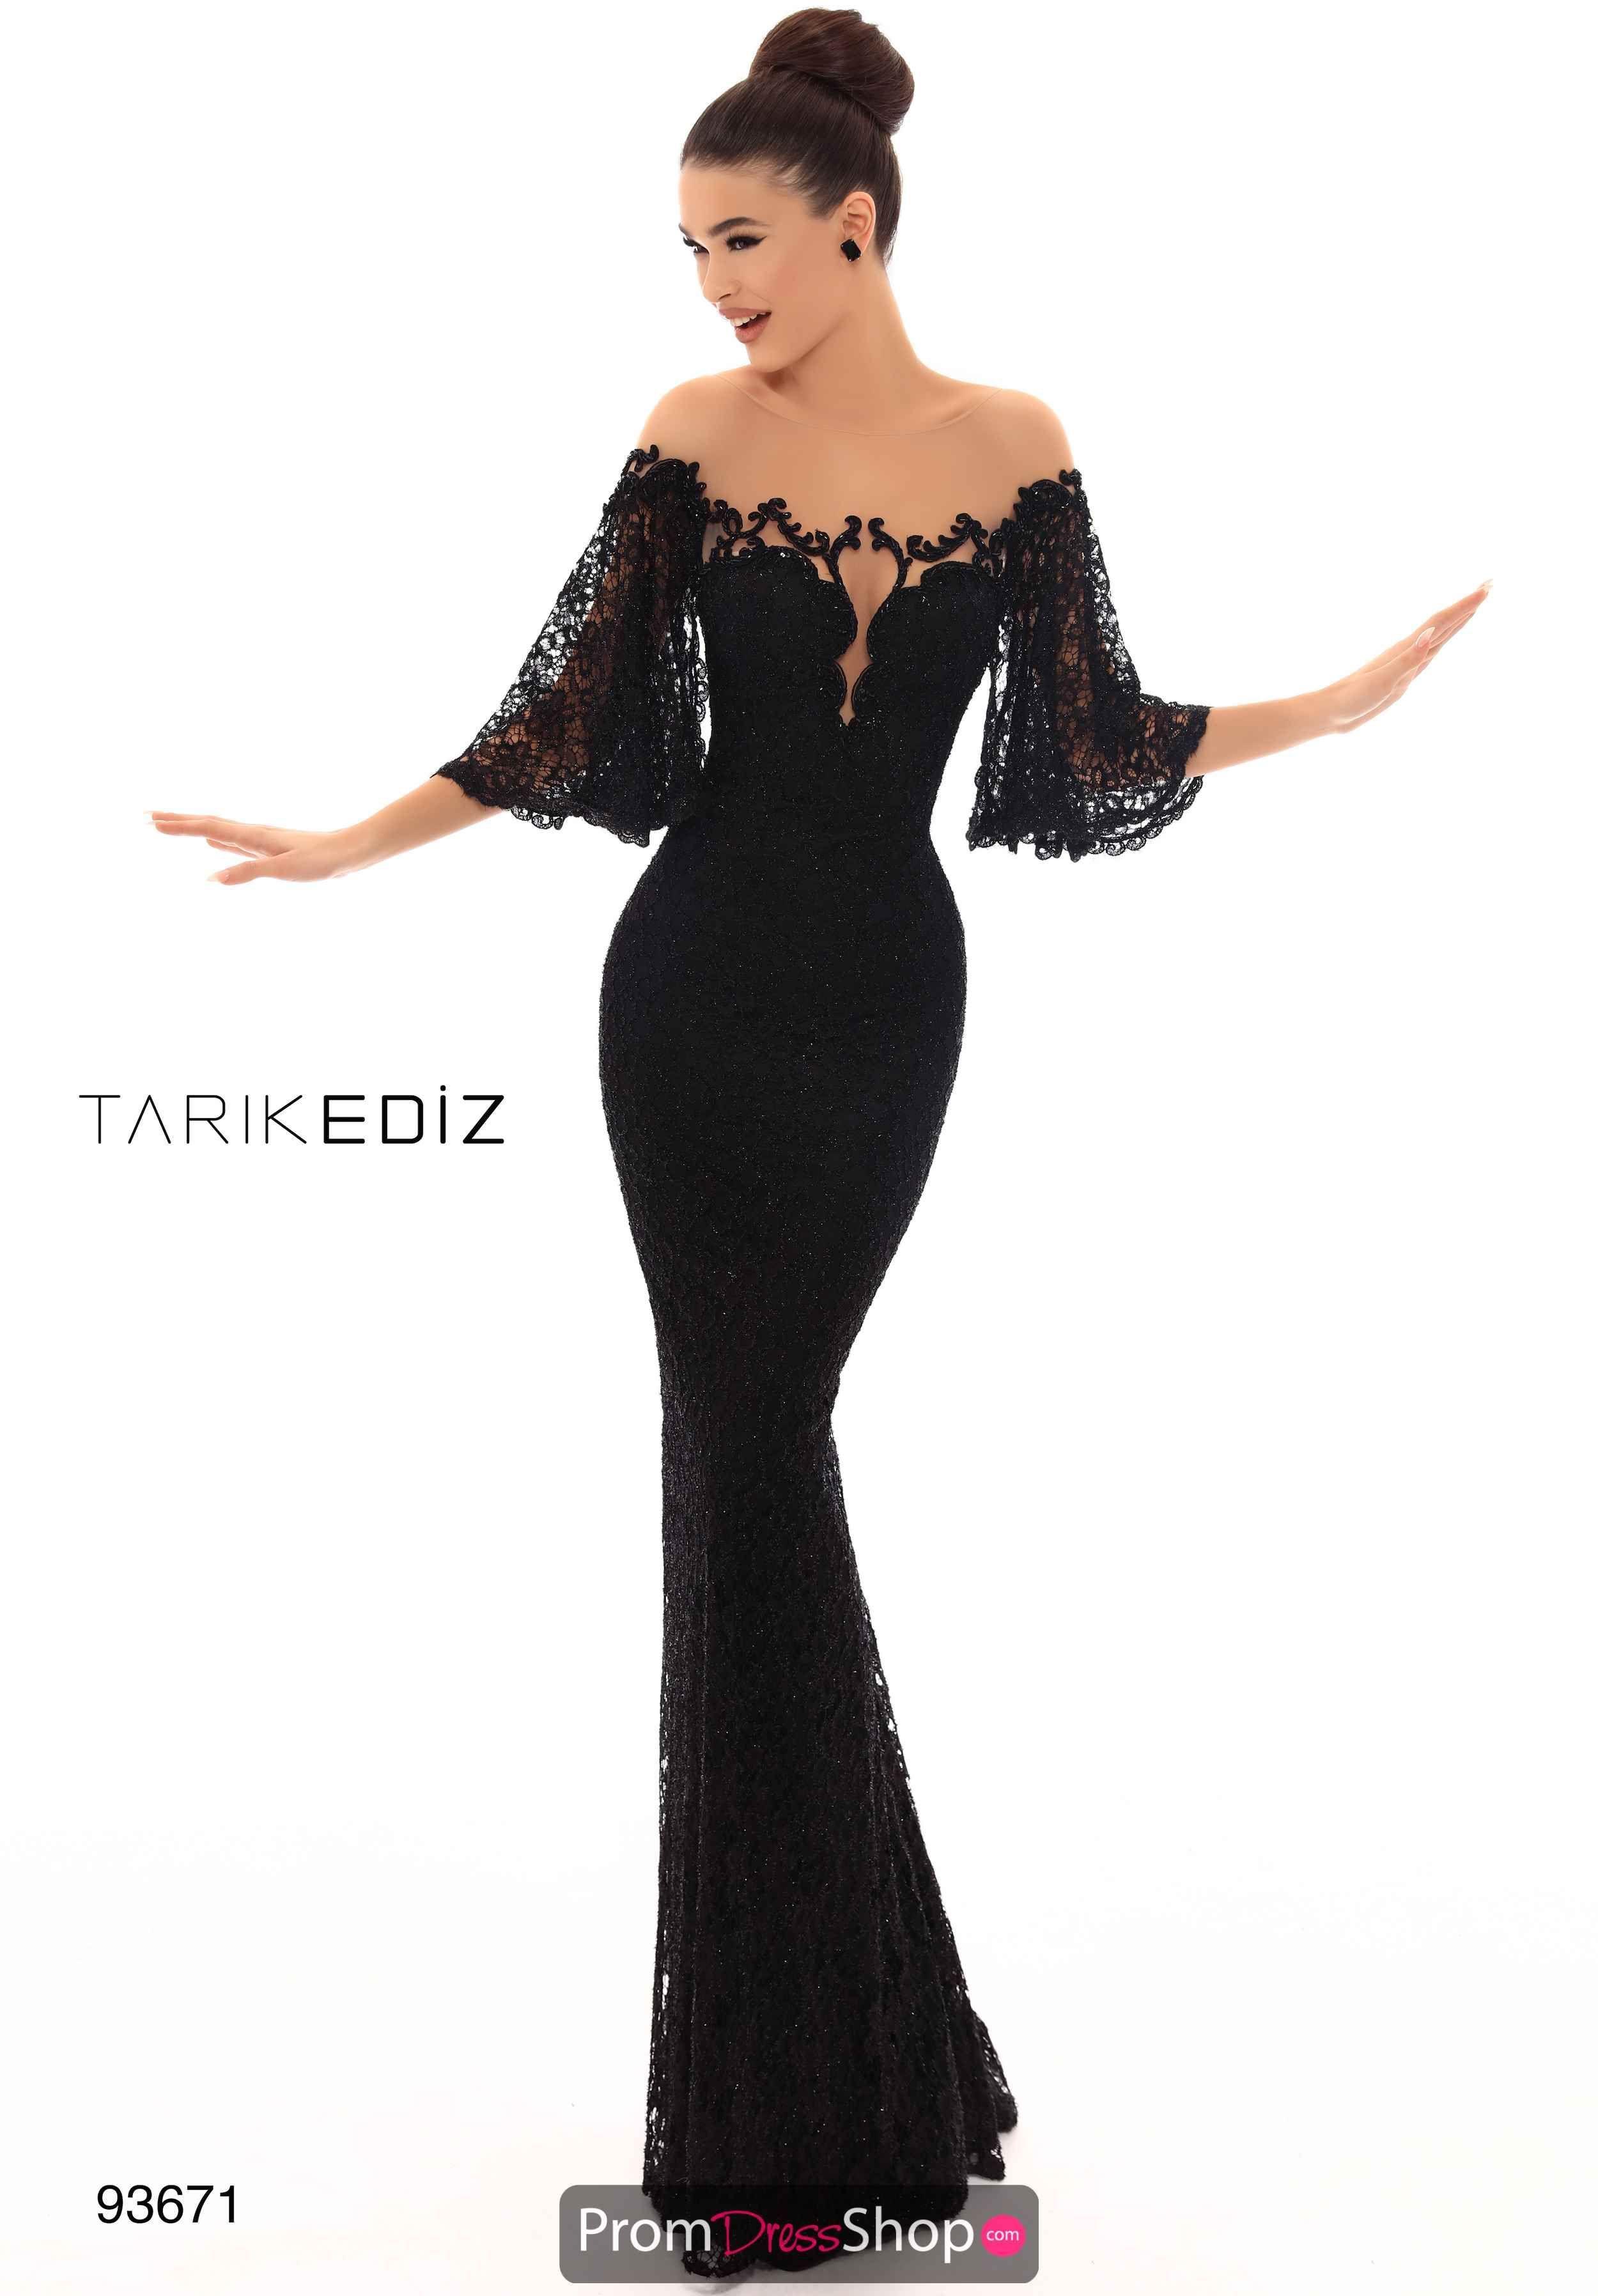 tarik ediz dress 93671   promdressshop, #dress #ediz